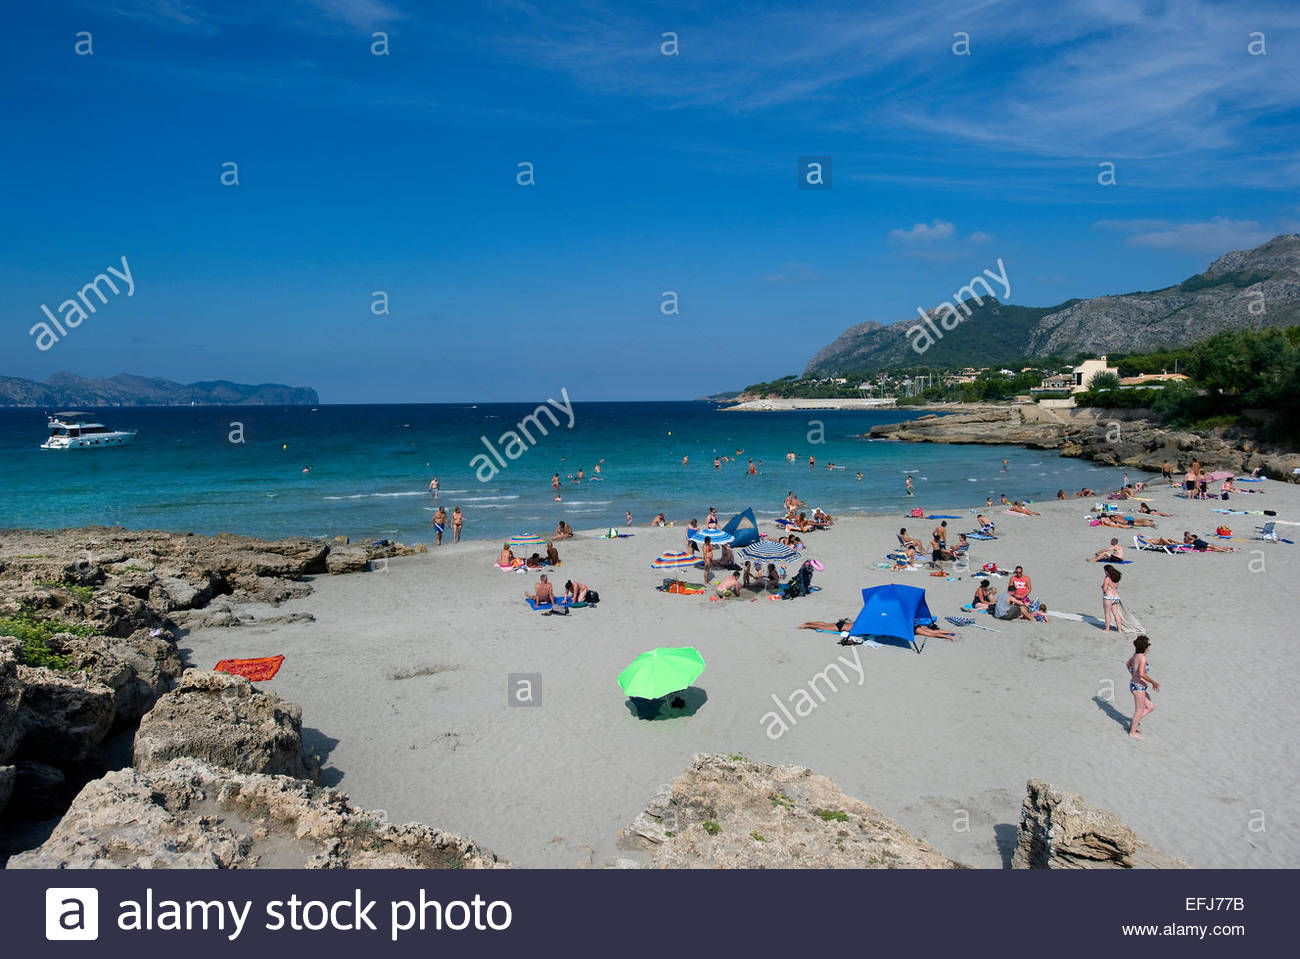 Mal Pas Plage, Playa de Sant Pere, Bonaire, Alcudia, Majorque, Baleares, Espagne Photo Stock